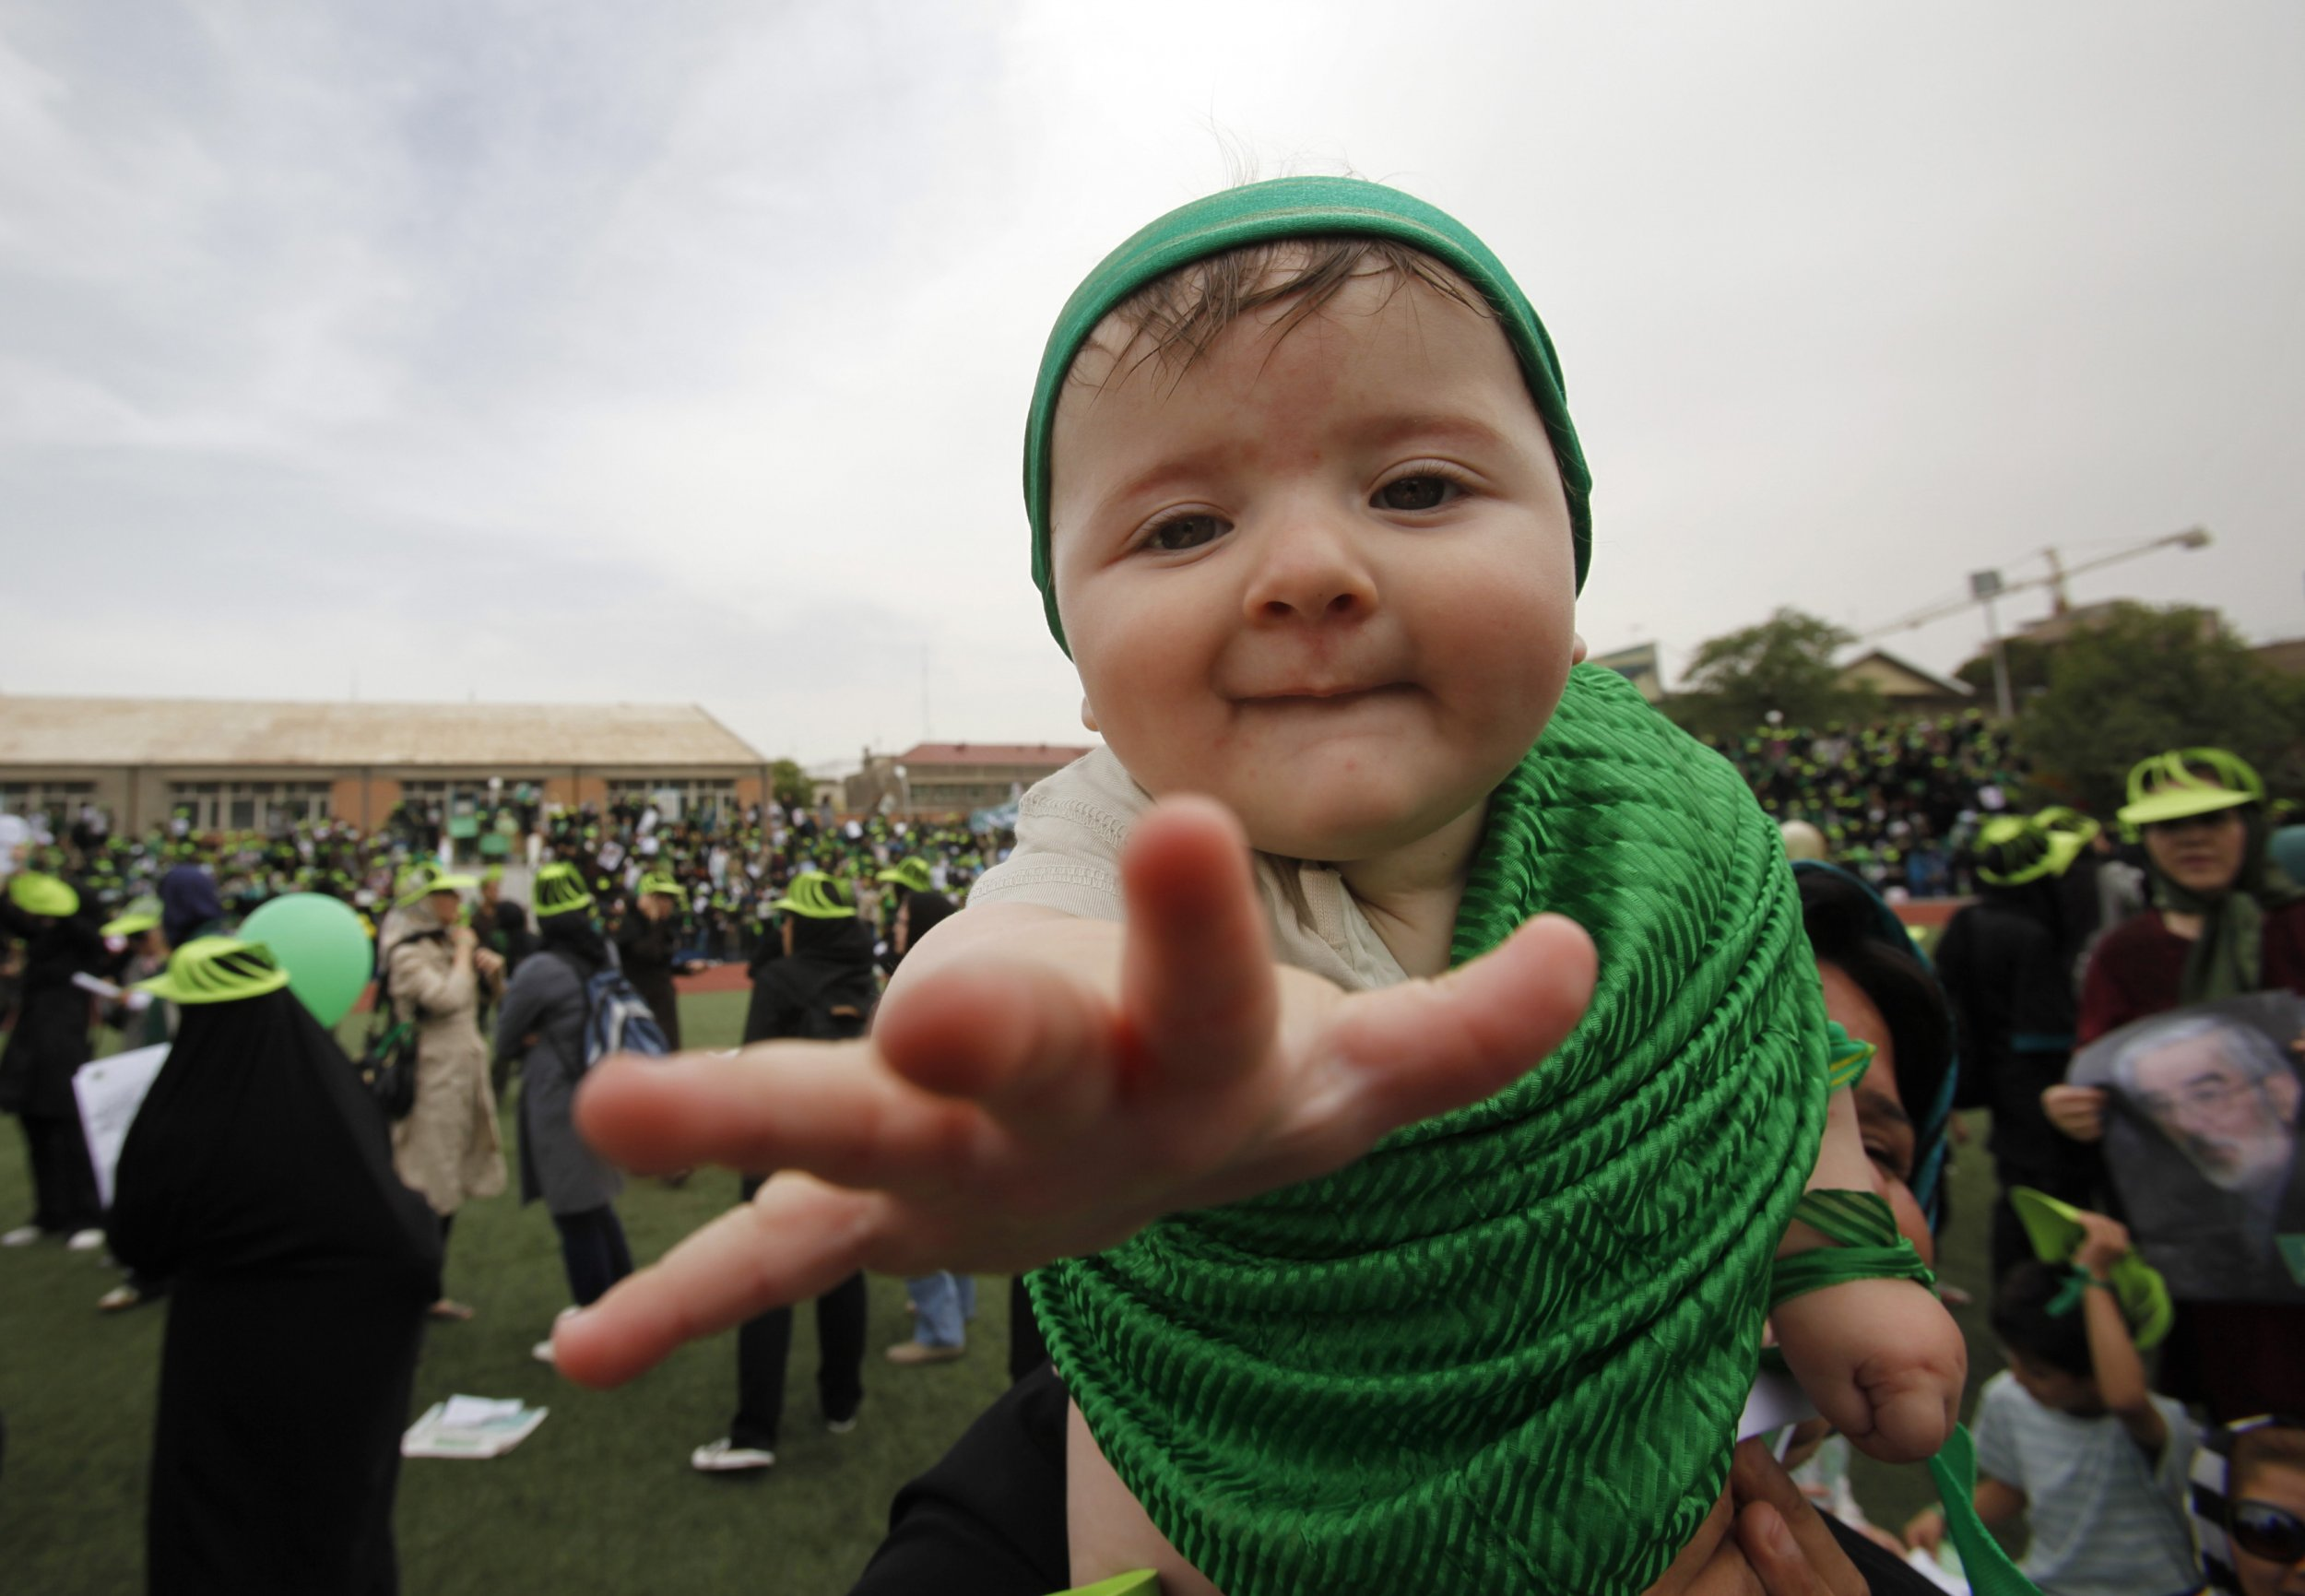 Iran baby